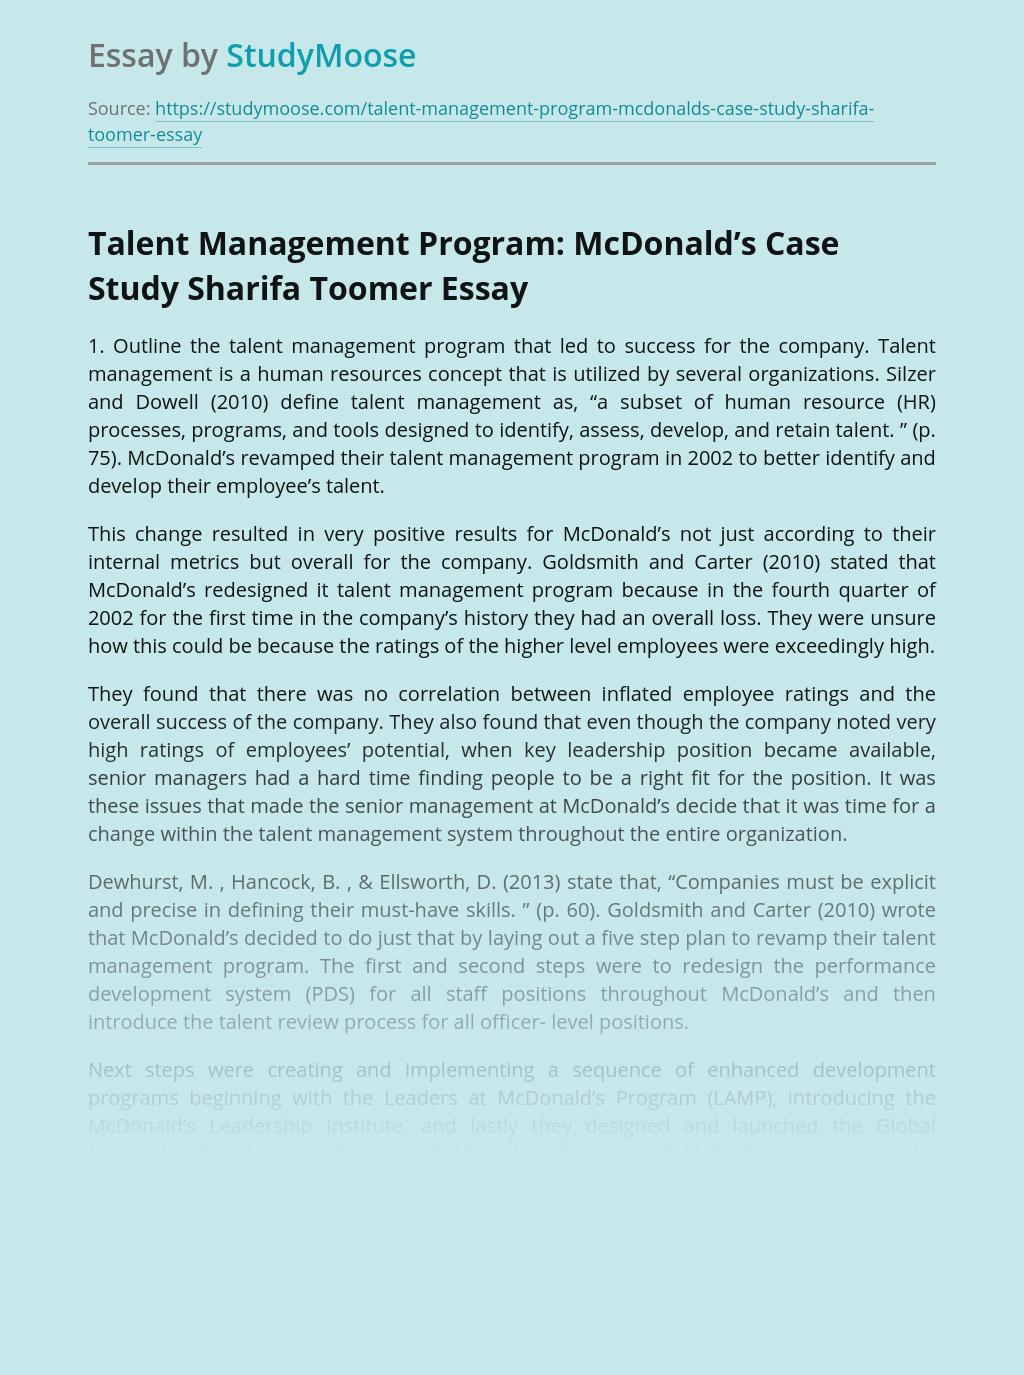 Talent Management Program: McDonald's Case Study Sharifa Toomer